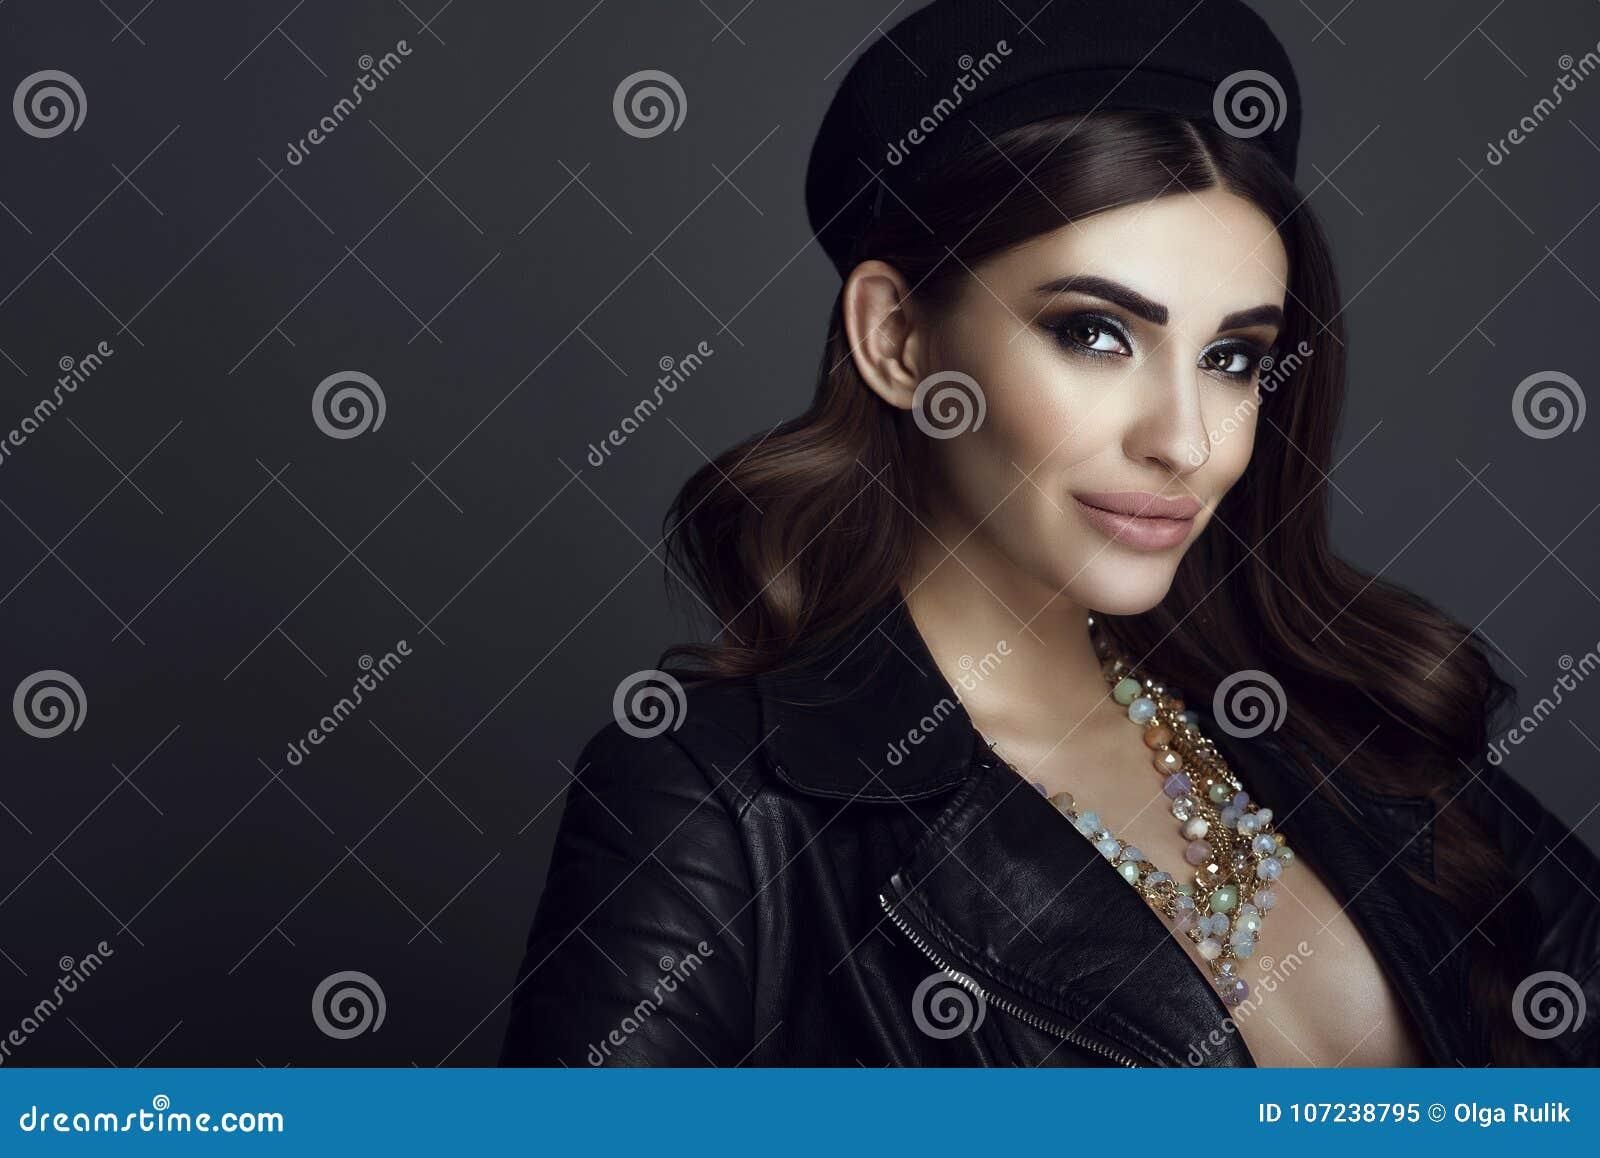 Maakt het Glam donker-haired model met mooi omhooggaand en vlot haar die zwarte pillendoosjehoed, leerjasje en gemhalsband dragen